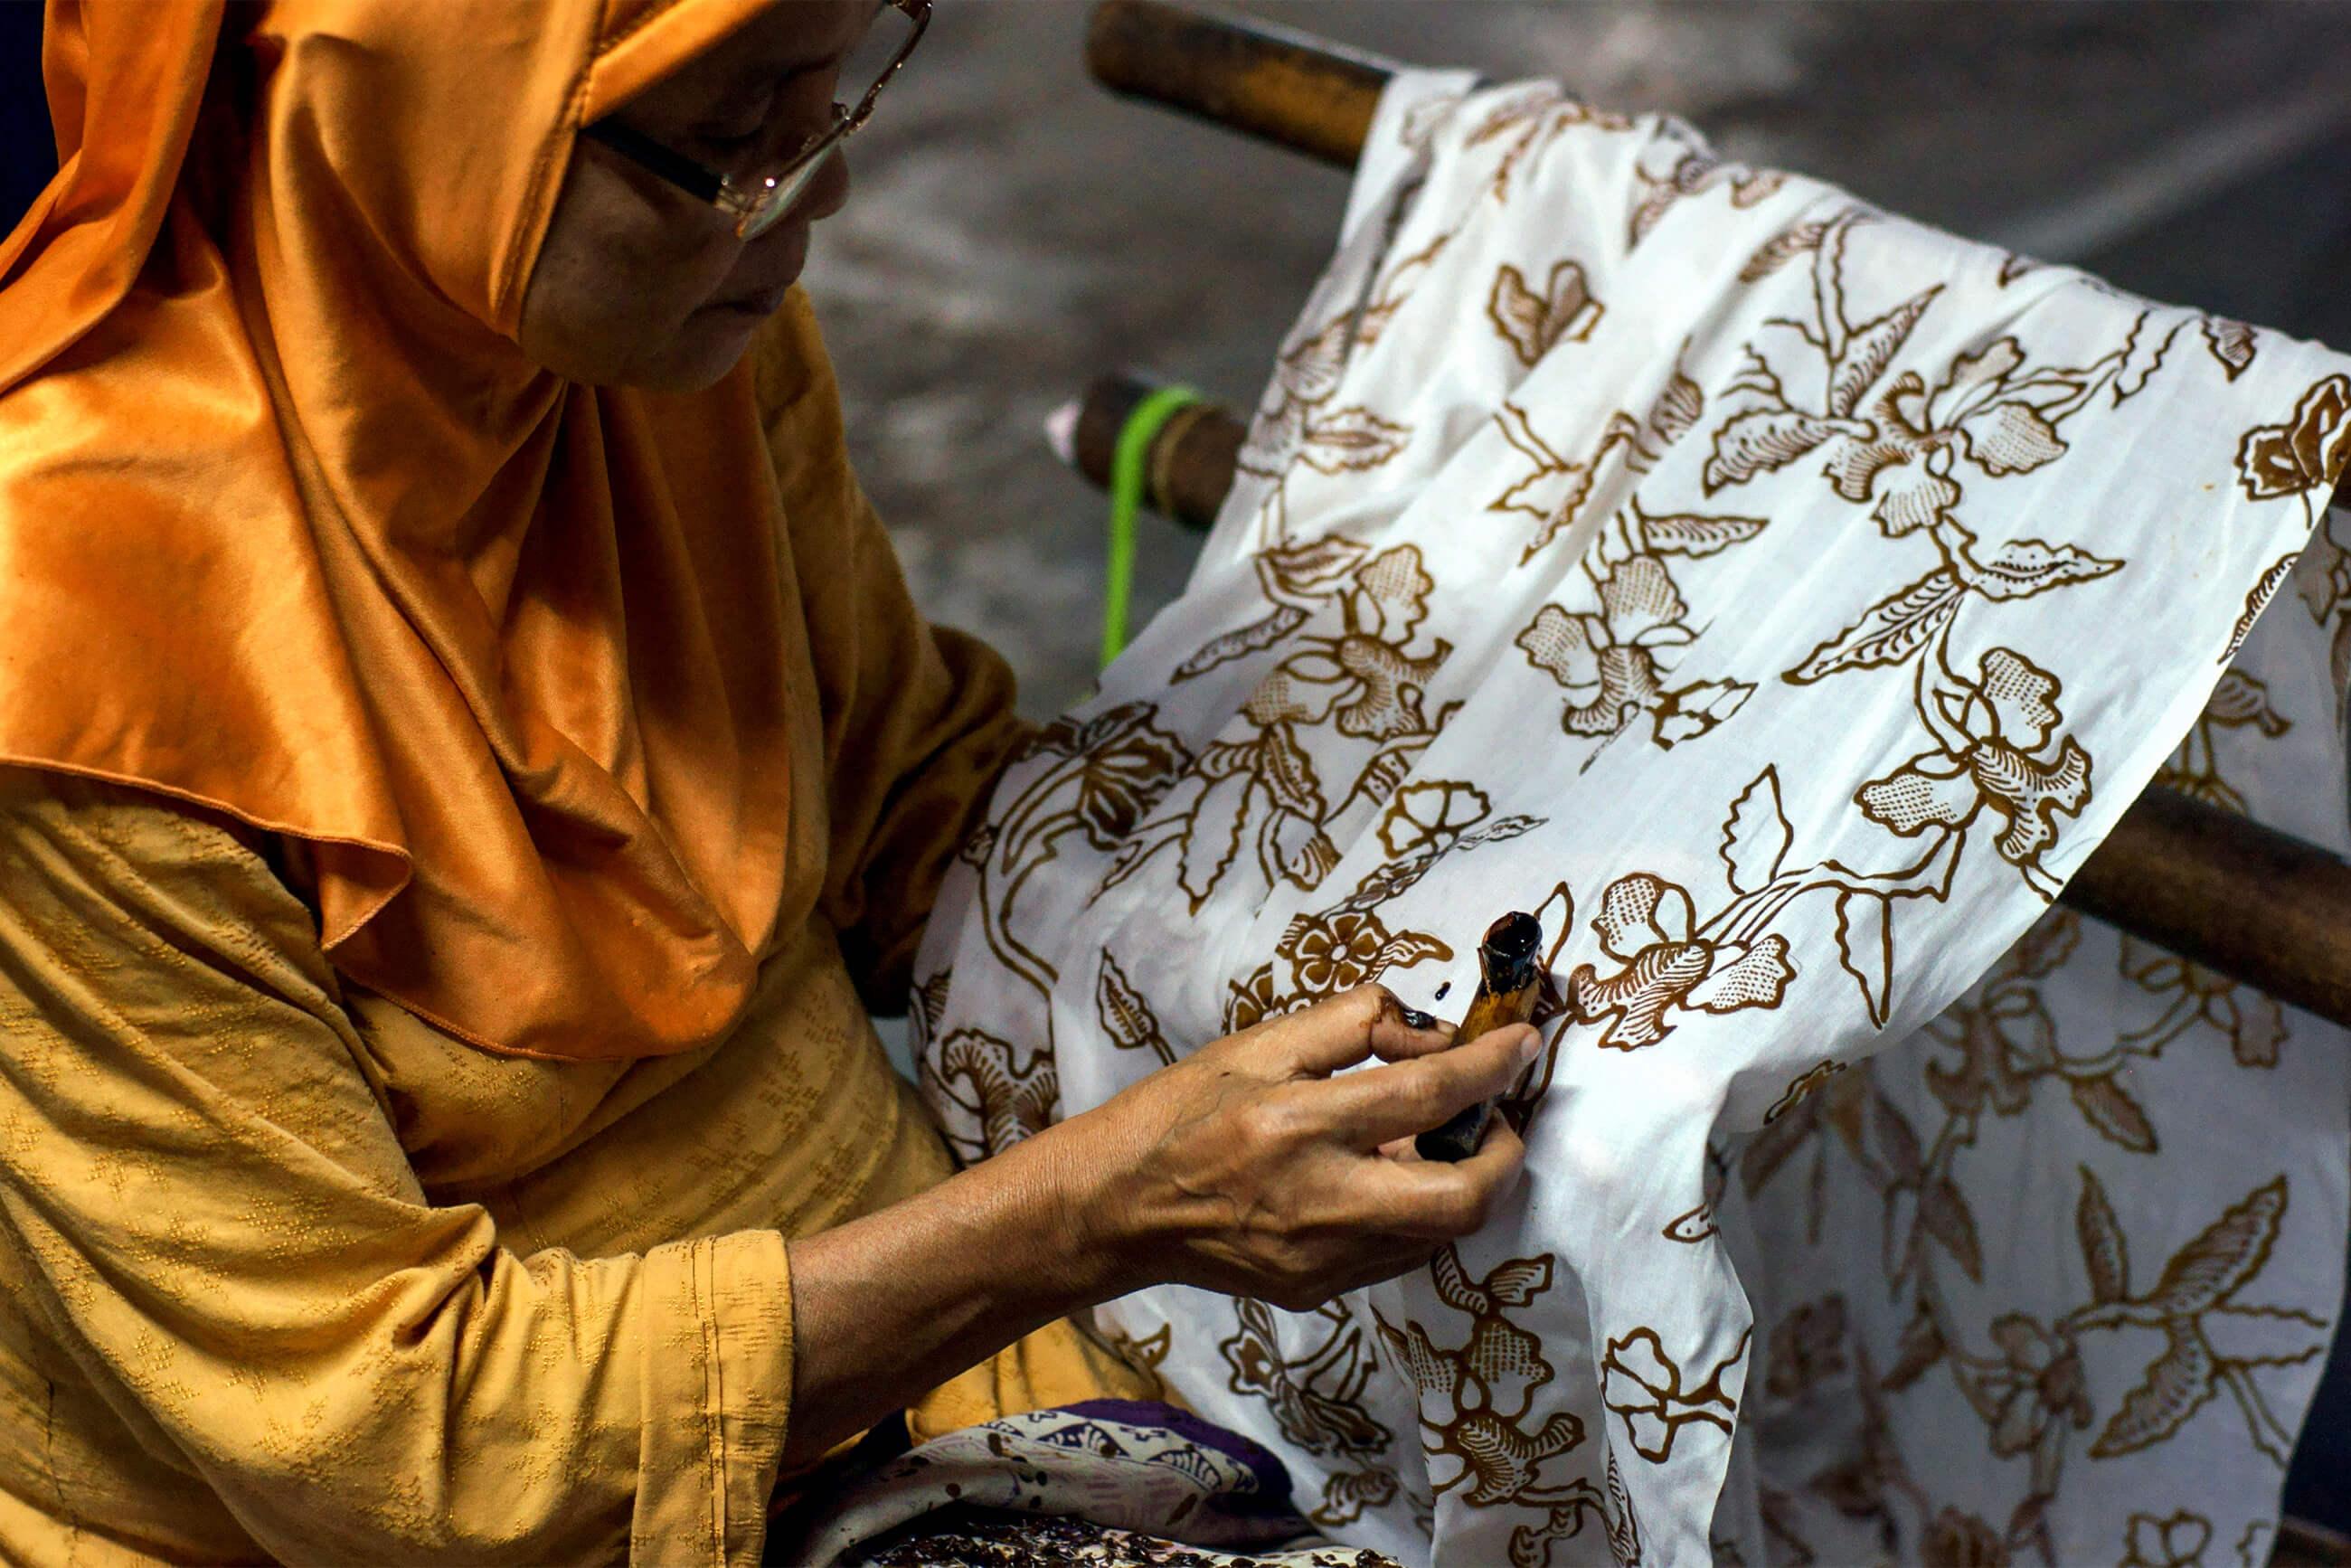 https://bubo.sk/uploads/galleries/4921/archiv_indonezia_java-jozef-zeliznak-st.-05-2014-57--49.jpg